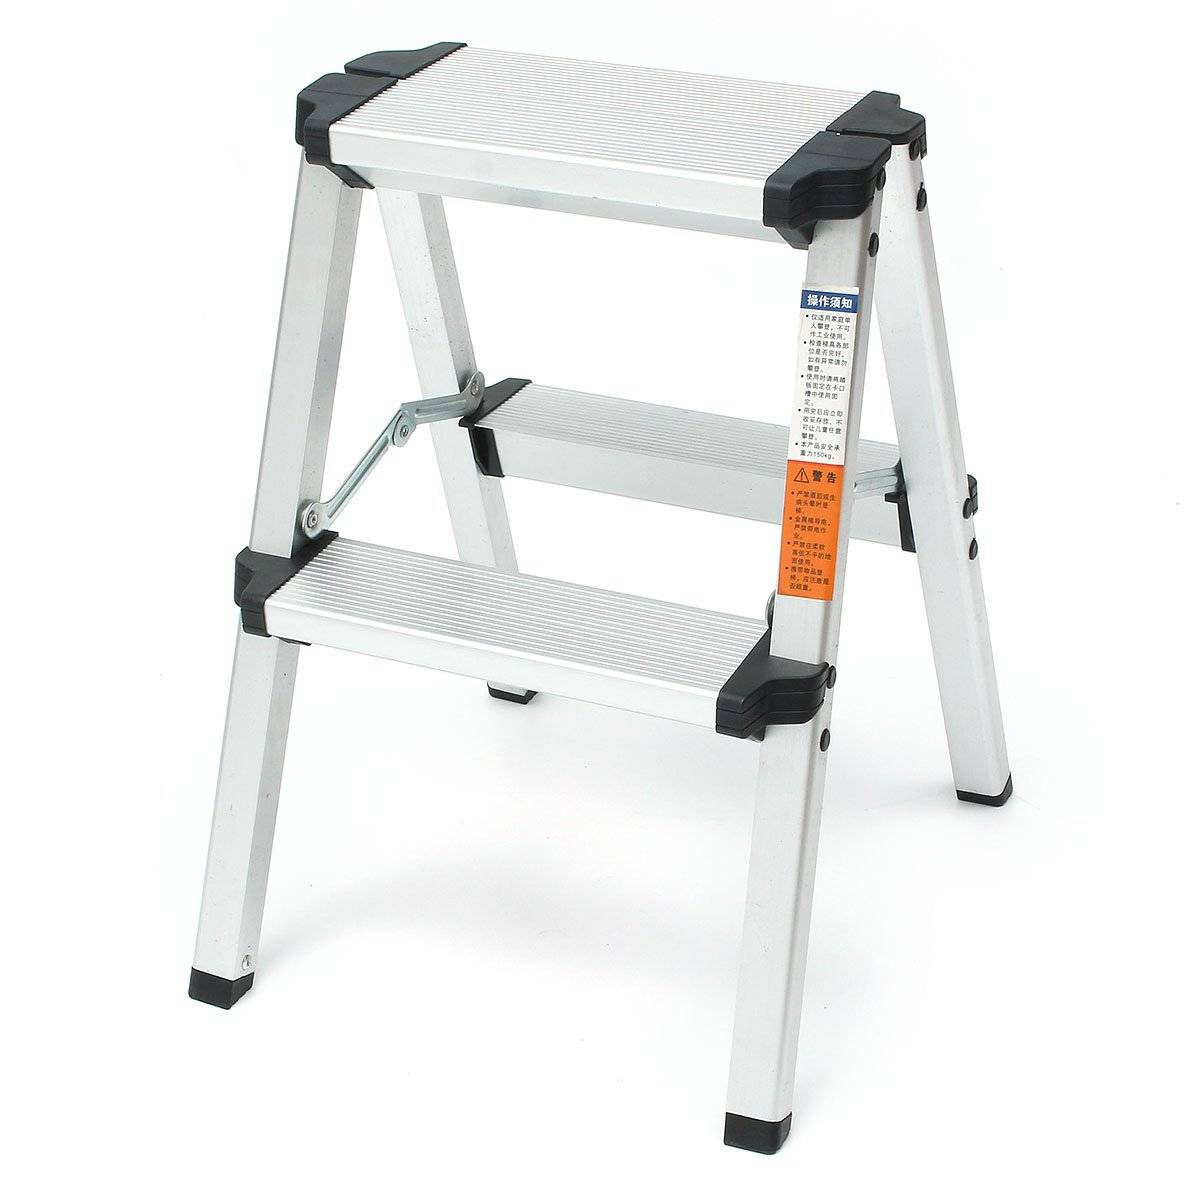 OlogyMart 150KG Maximum Load 2 Step Stool Folding Ladder Anti Slip Safety Alu um Ladder